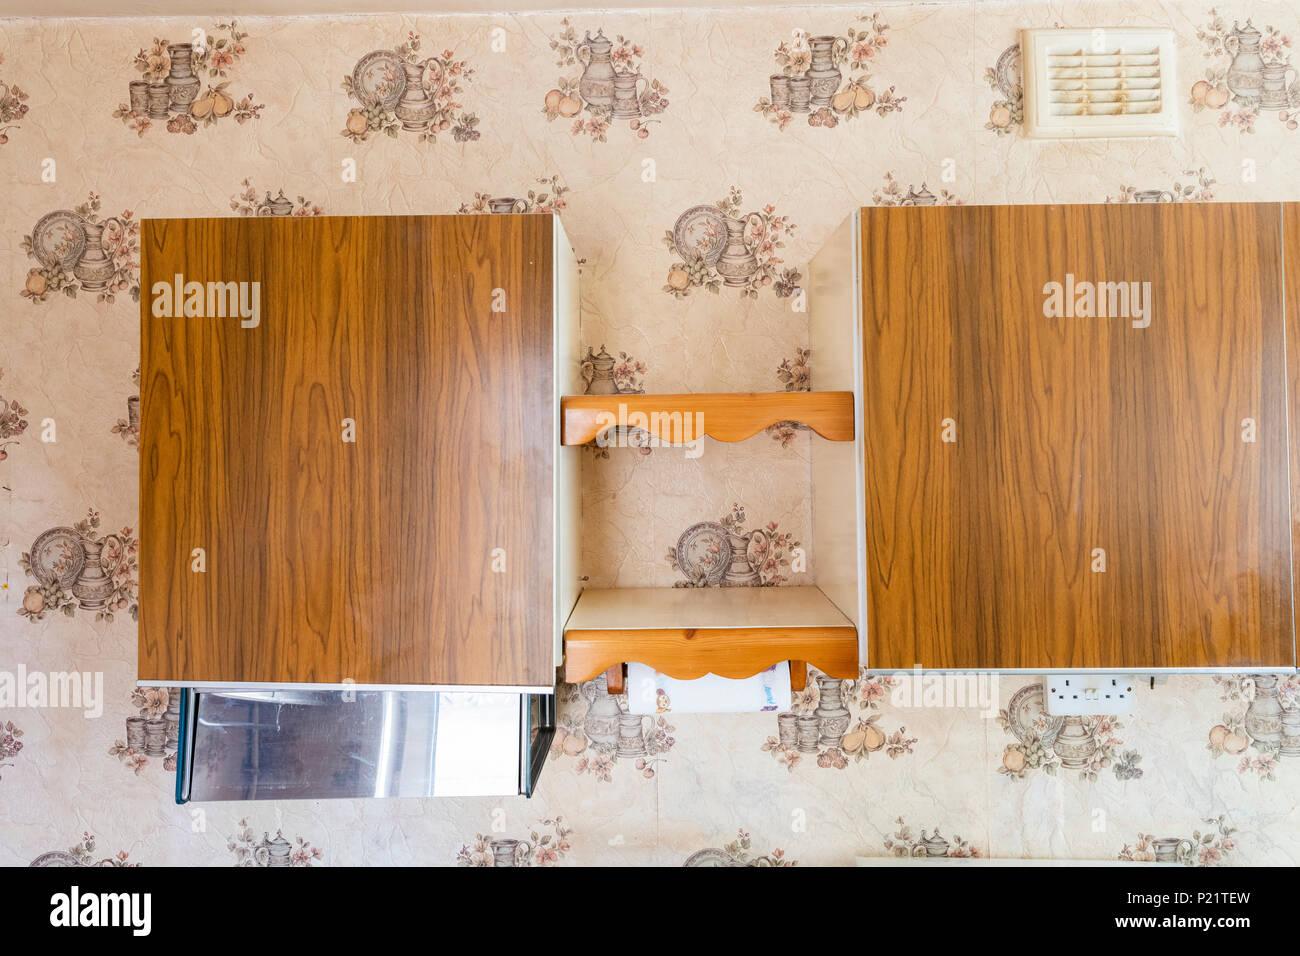 Mid Century Old Fashioned Worn Kitchen Cabinets Stock Photo Alamy